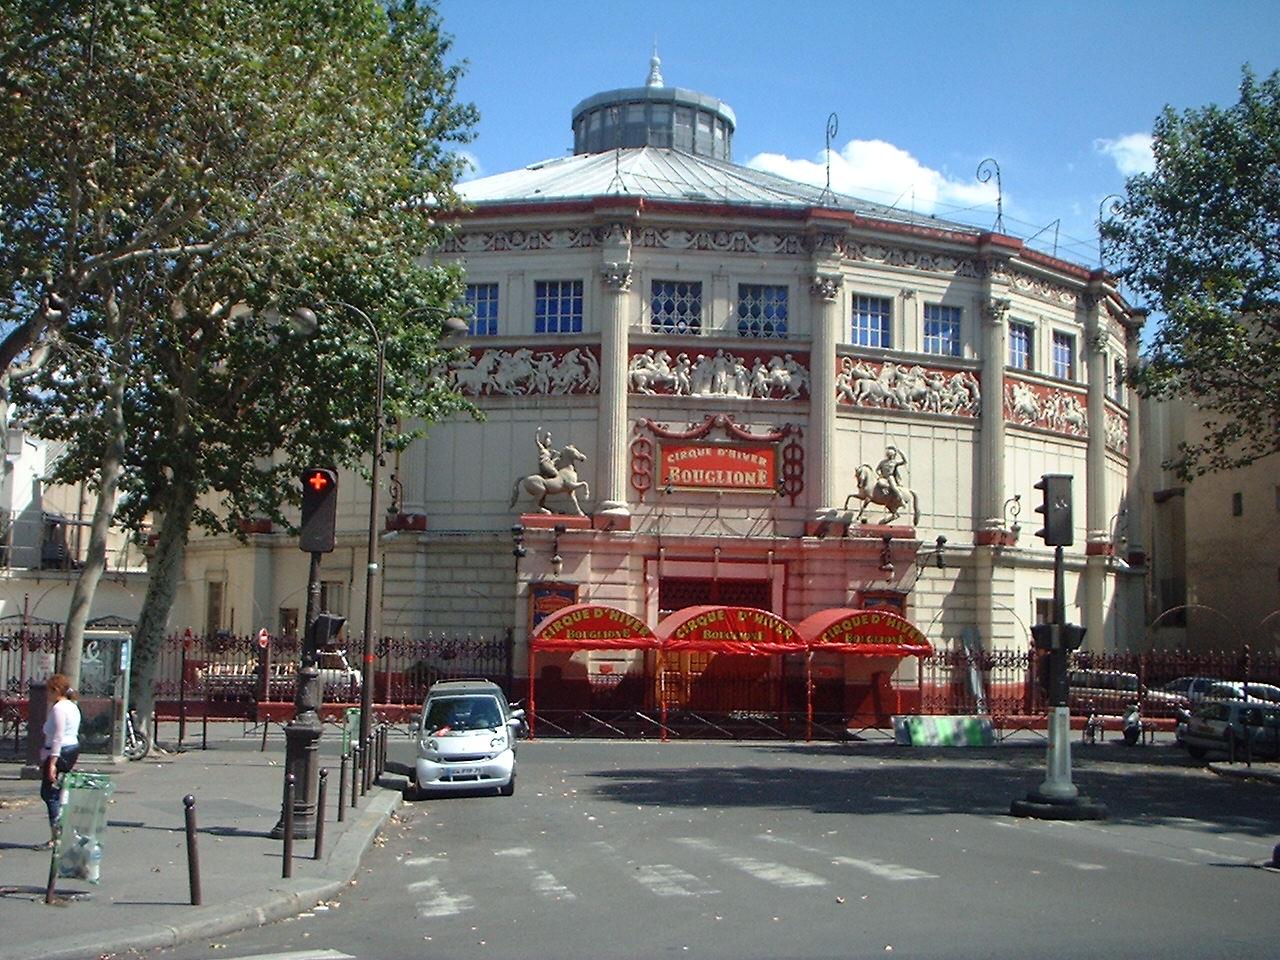 http://fr.academic.ru/pictures/frwiki/76/Le_cirque_d%27hiver_Paris_01.jpg